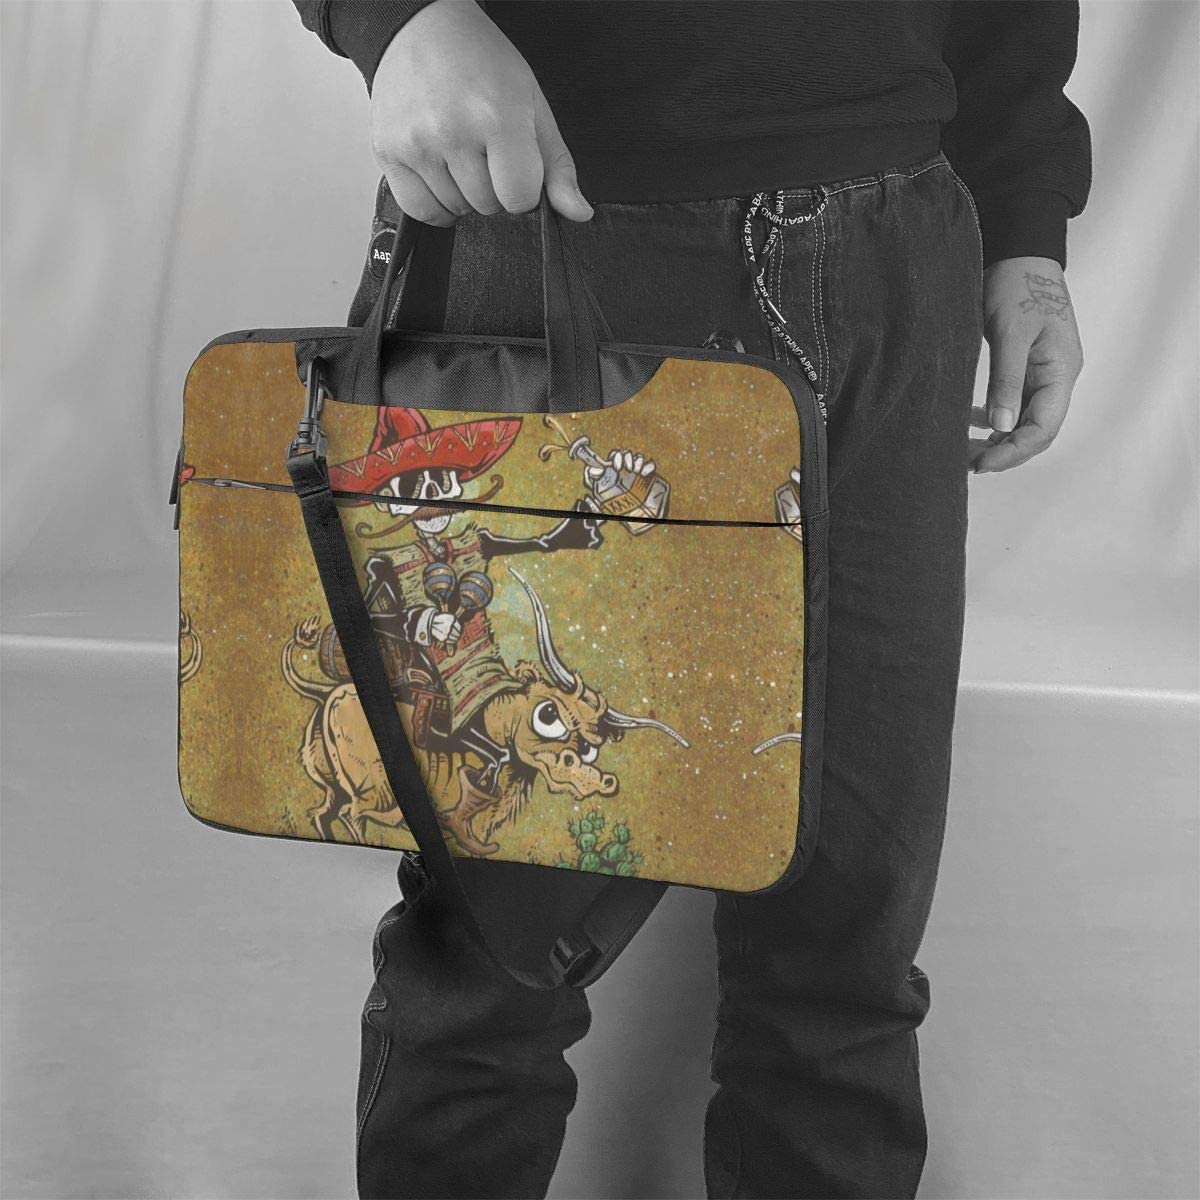 Cows Skull Briefcase Protective Bag Laptop Shoulder Bag 13 Inch